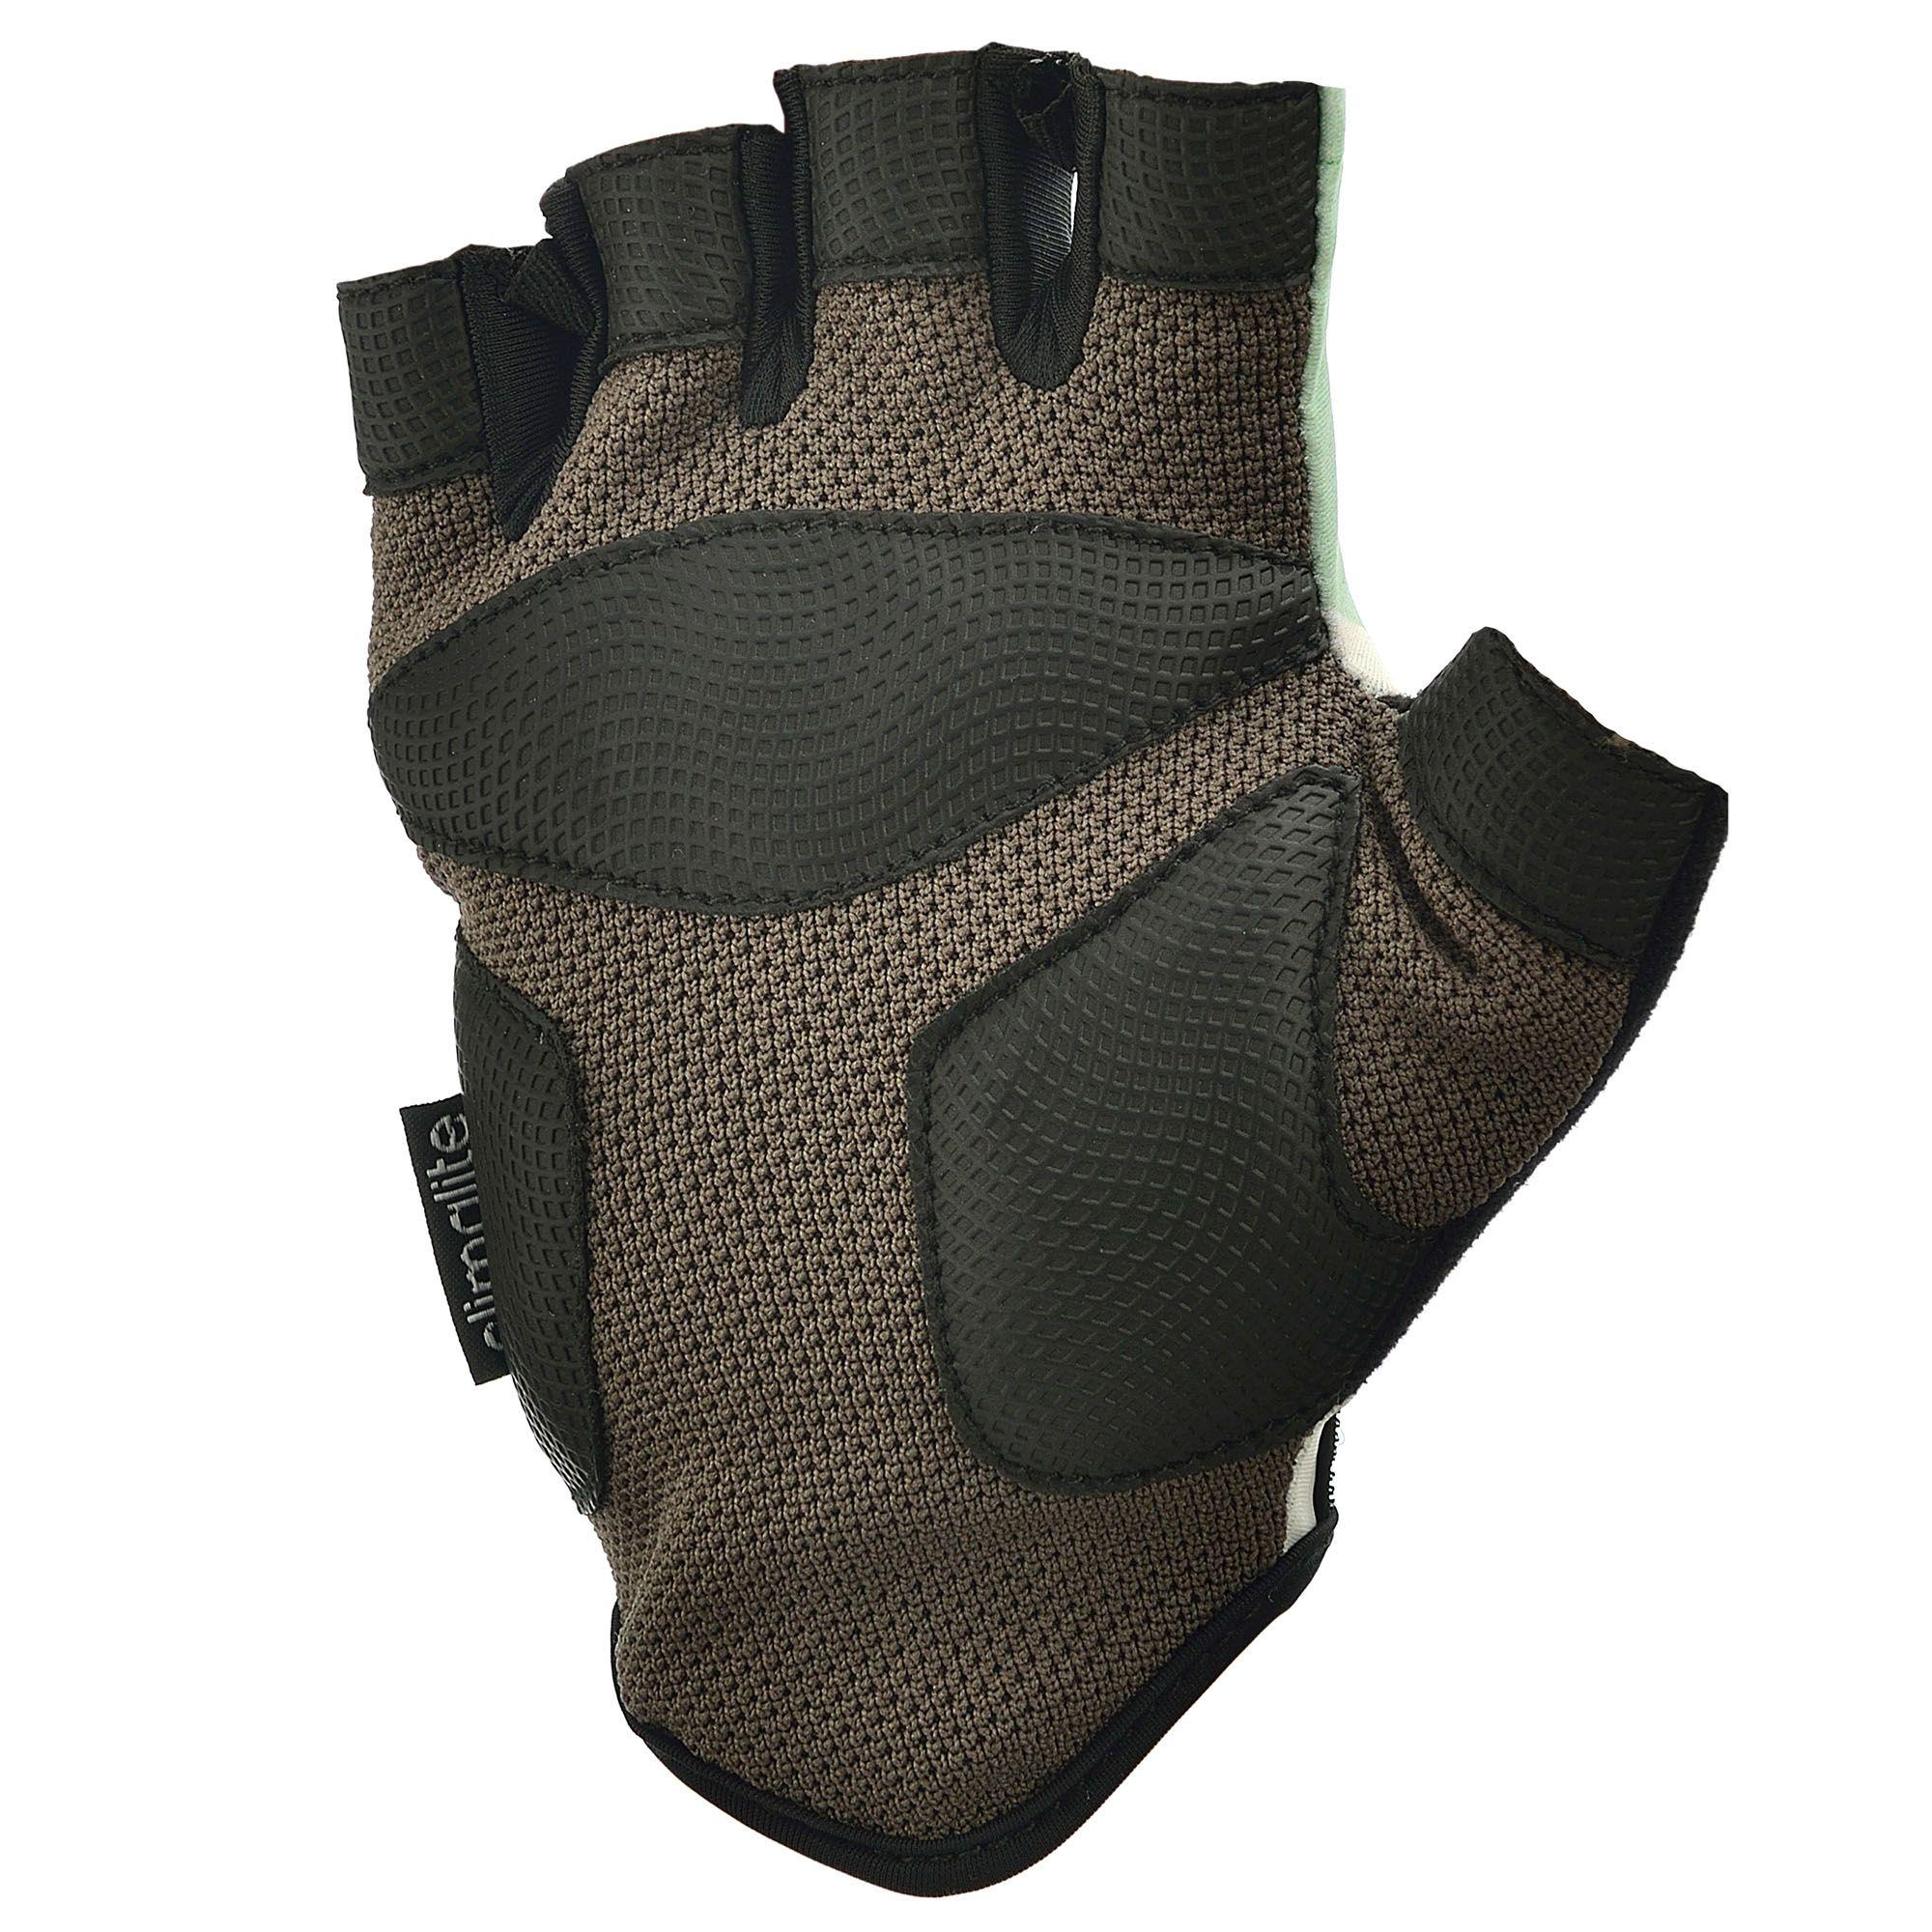 Cheap Fitness Gloves: Adidas Half Finger Ladies Fitness Gloves